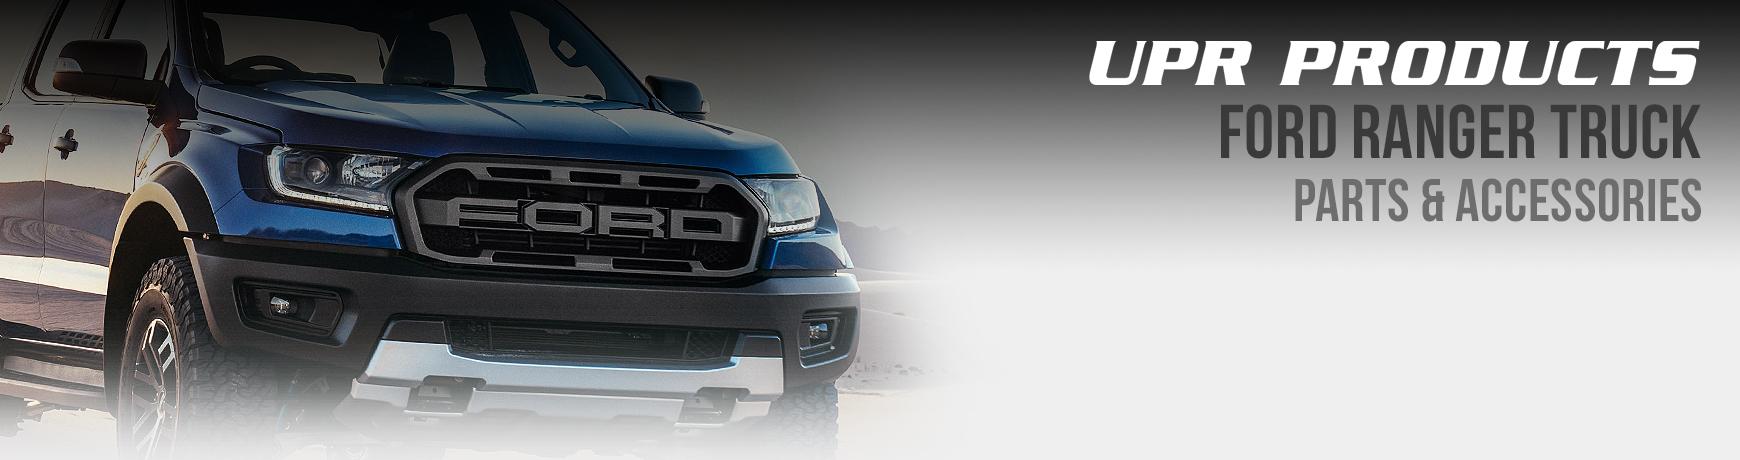 ford-ranger-parts-accessories.jpg